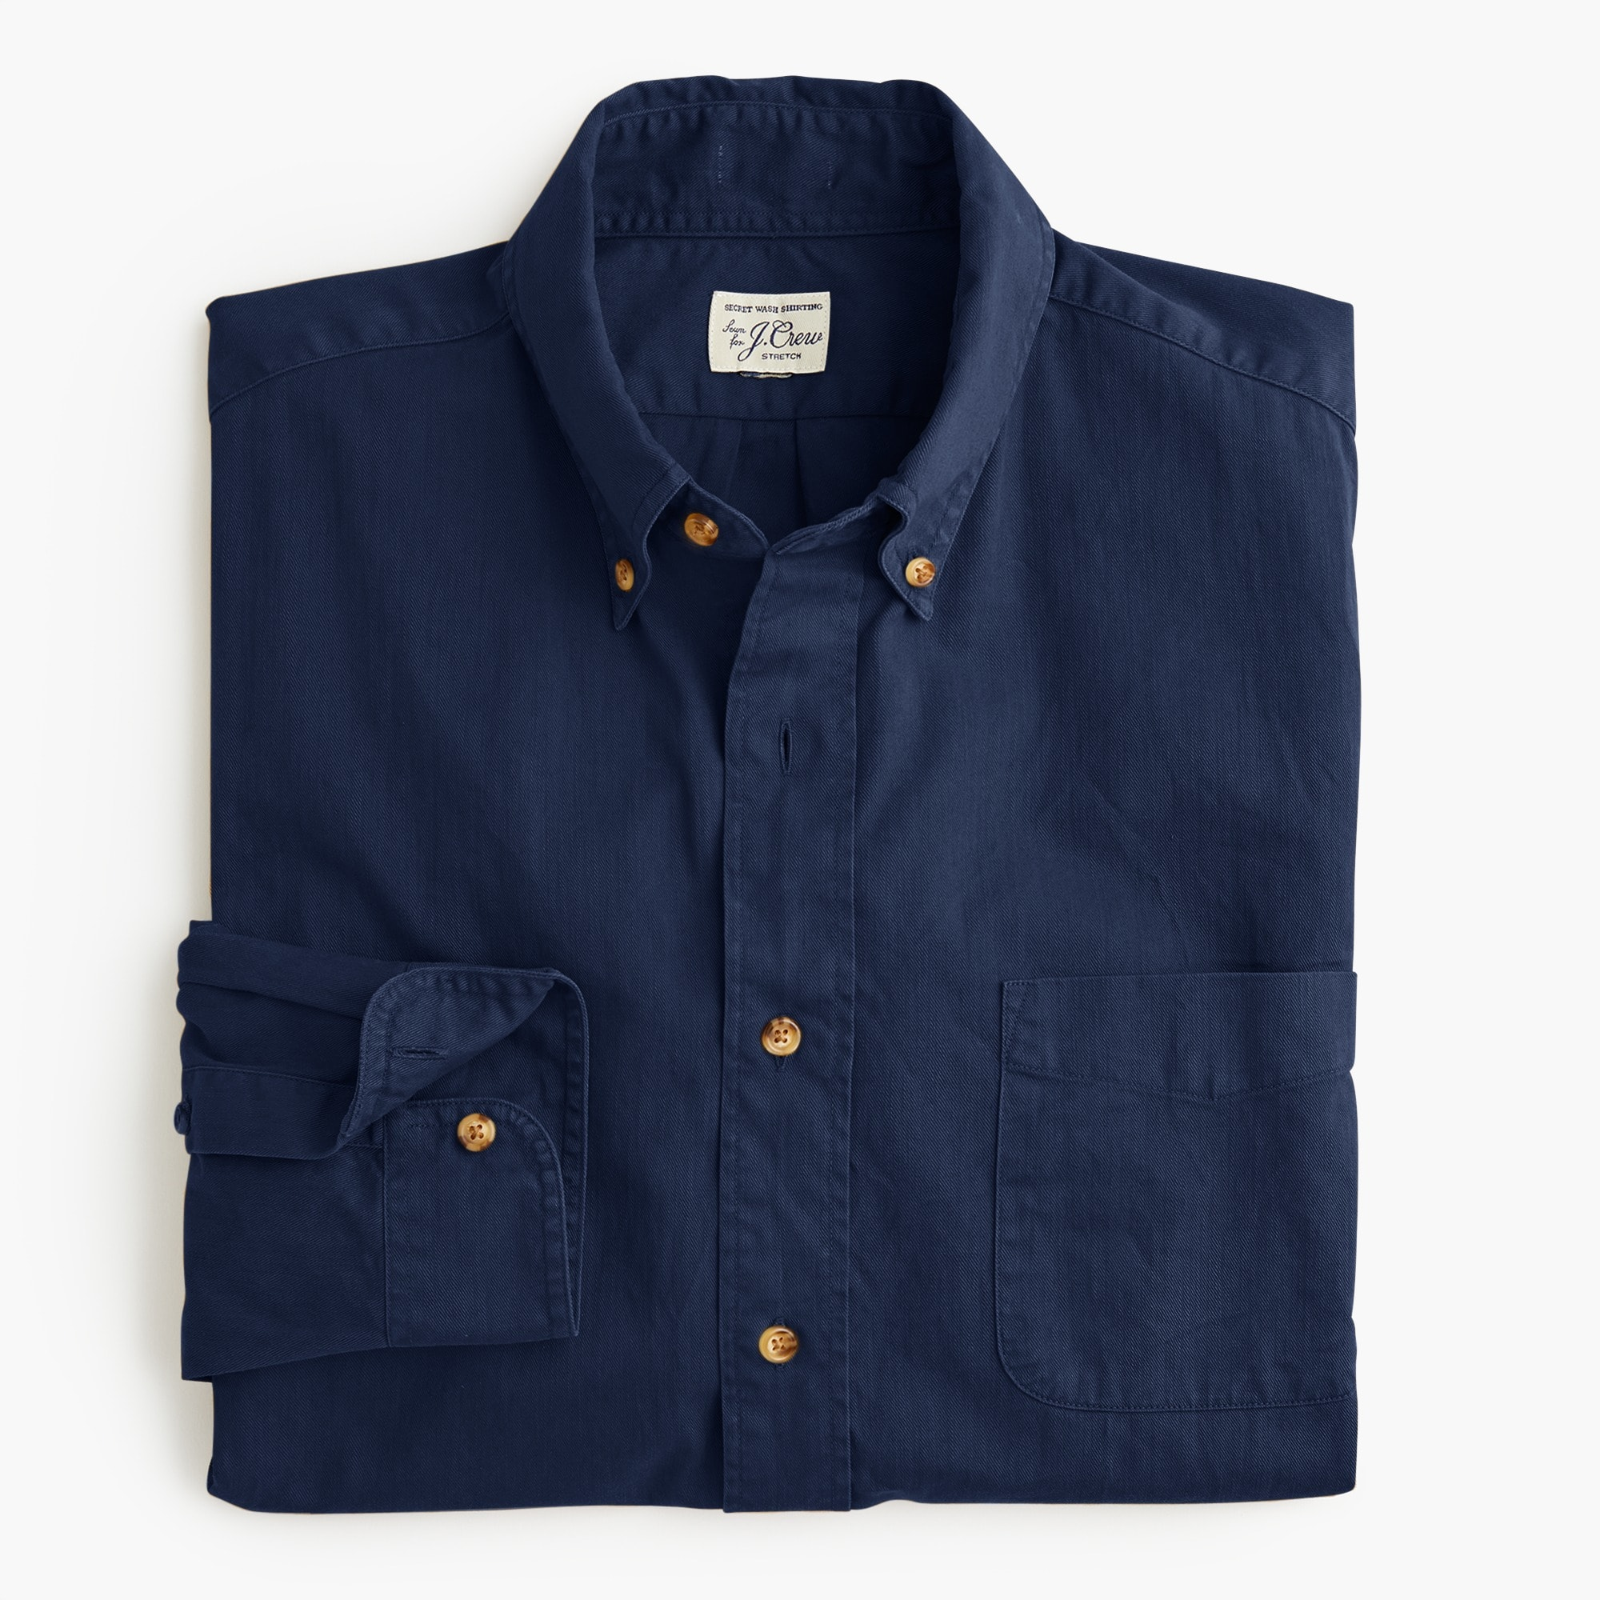 The 1987 twill shirt